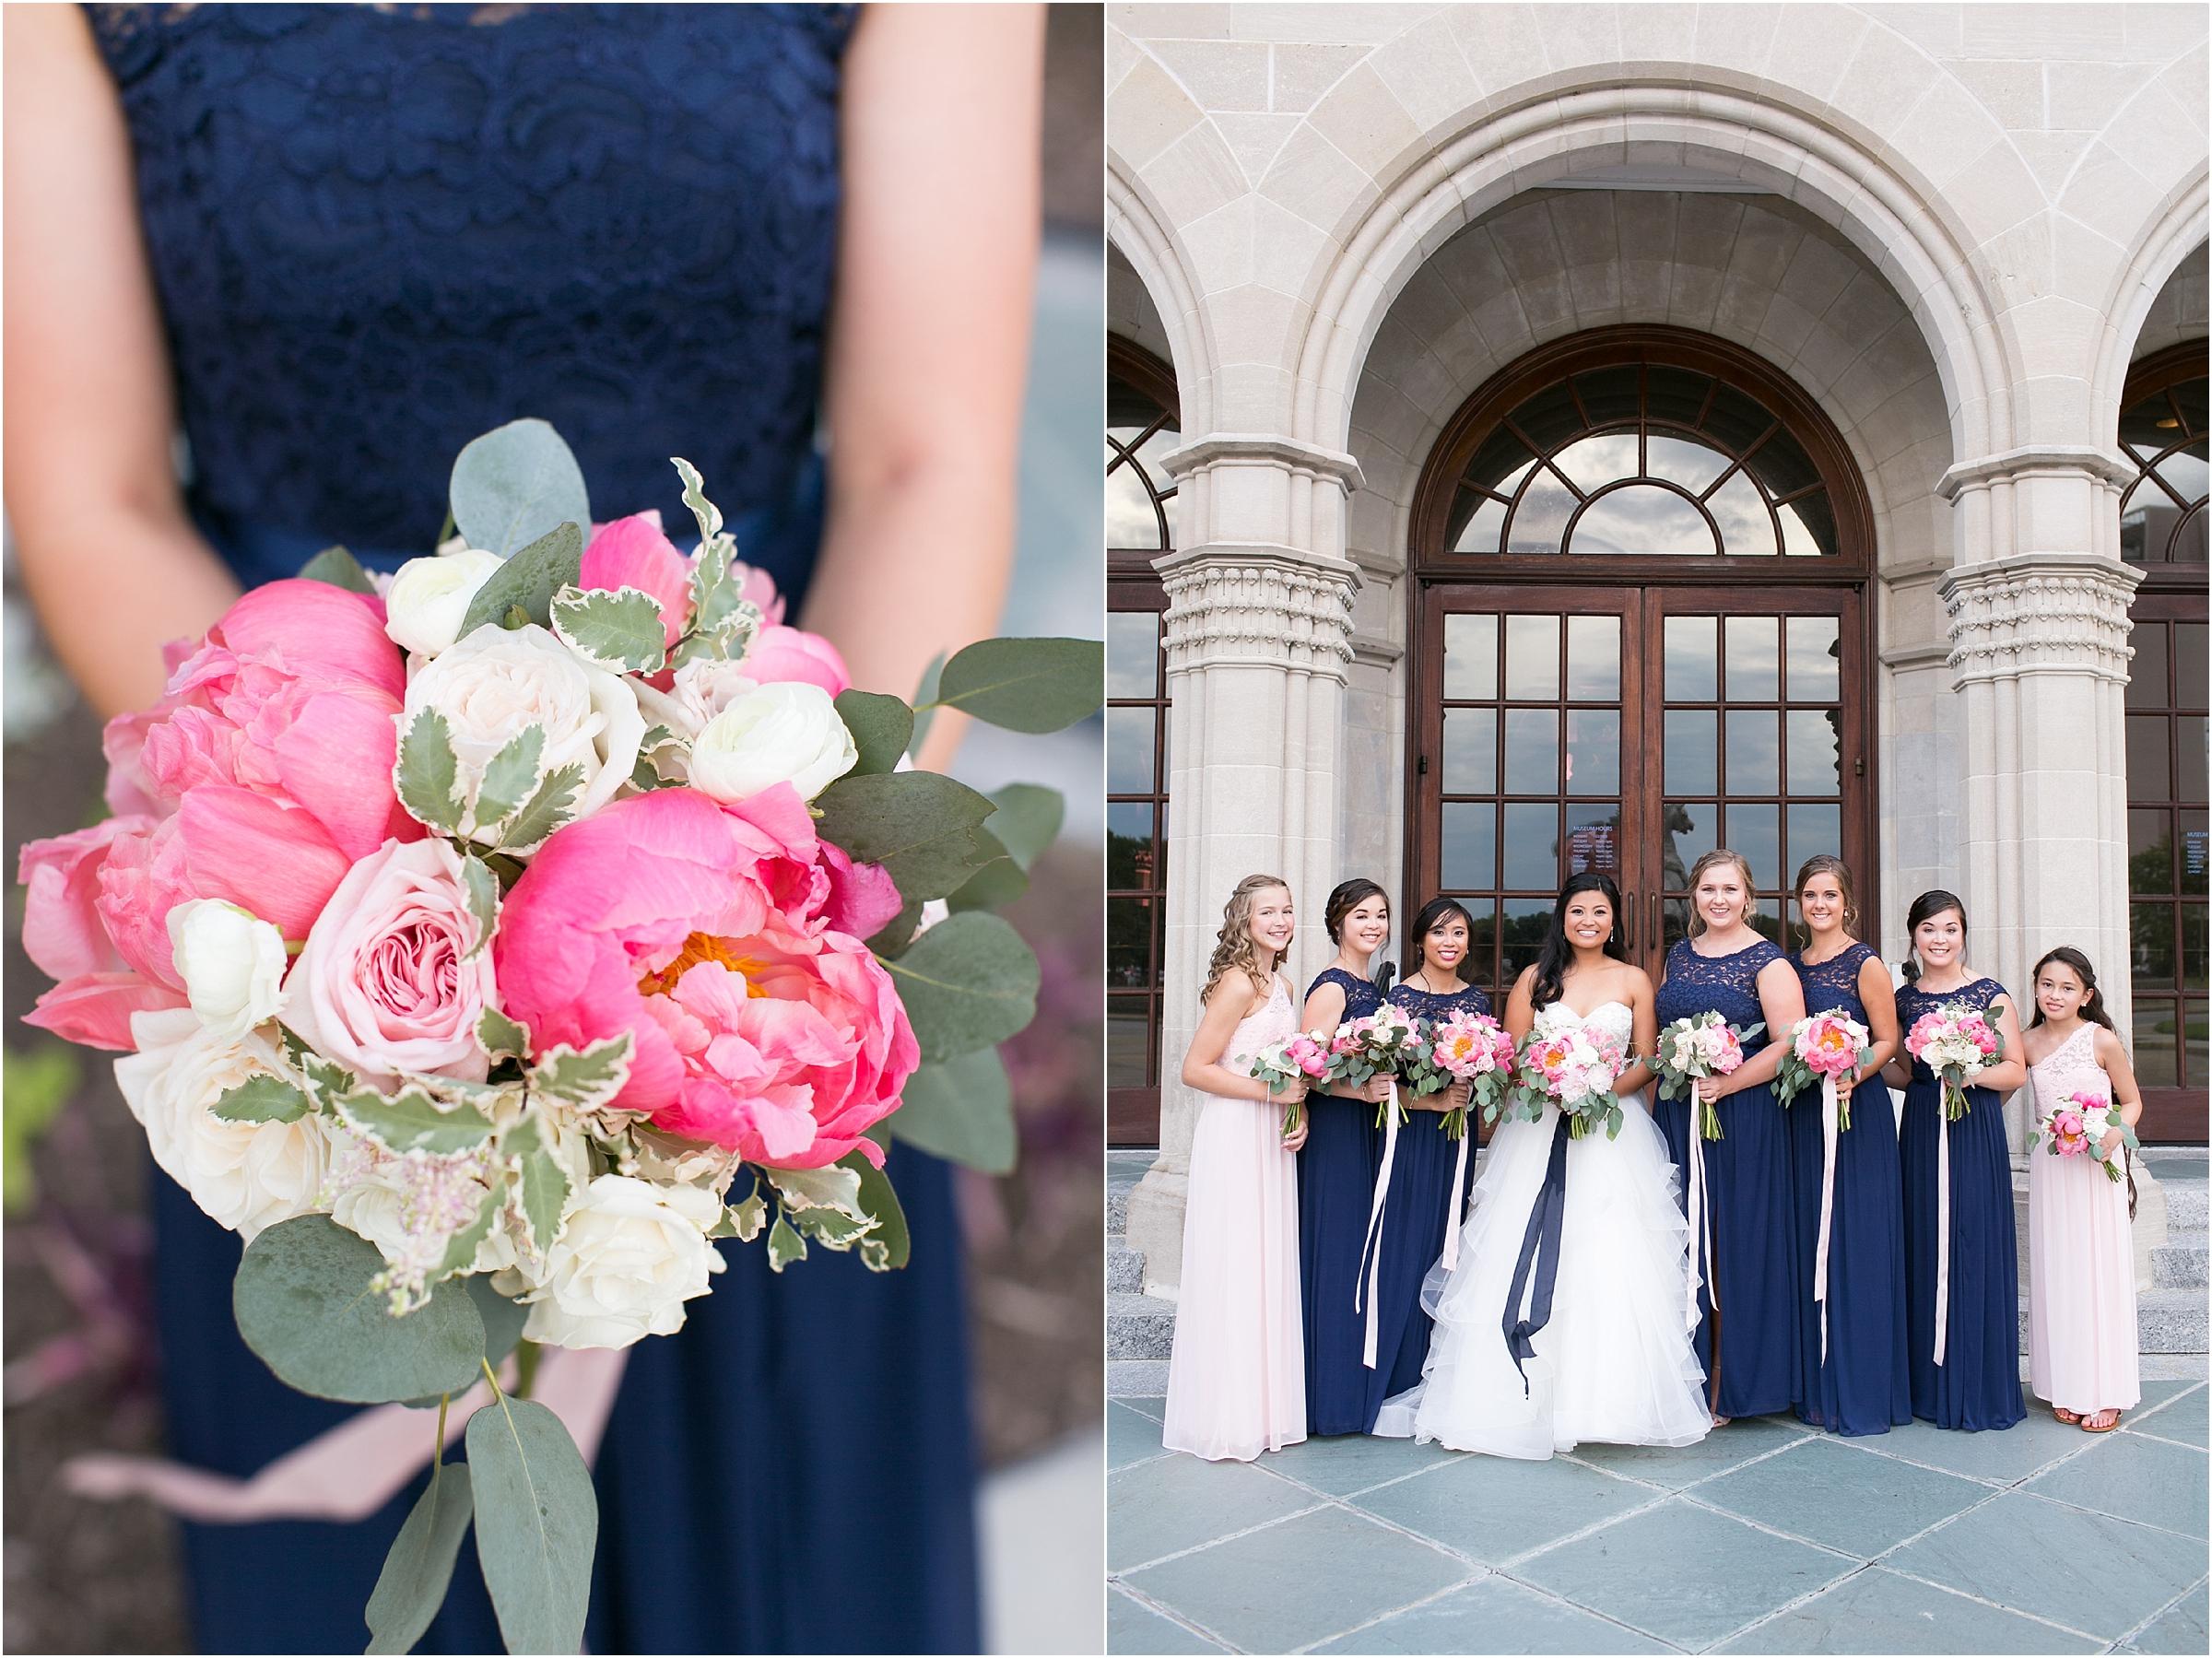 Chrysler Museum of Art grand elegant bridal party portrait courtney inghram events